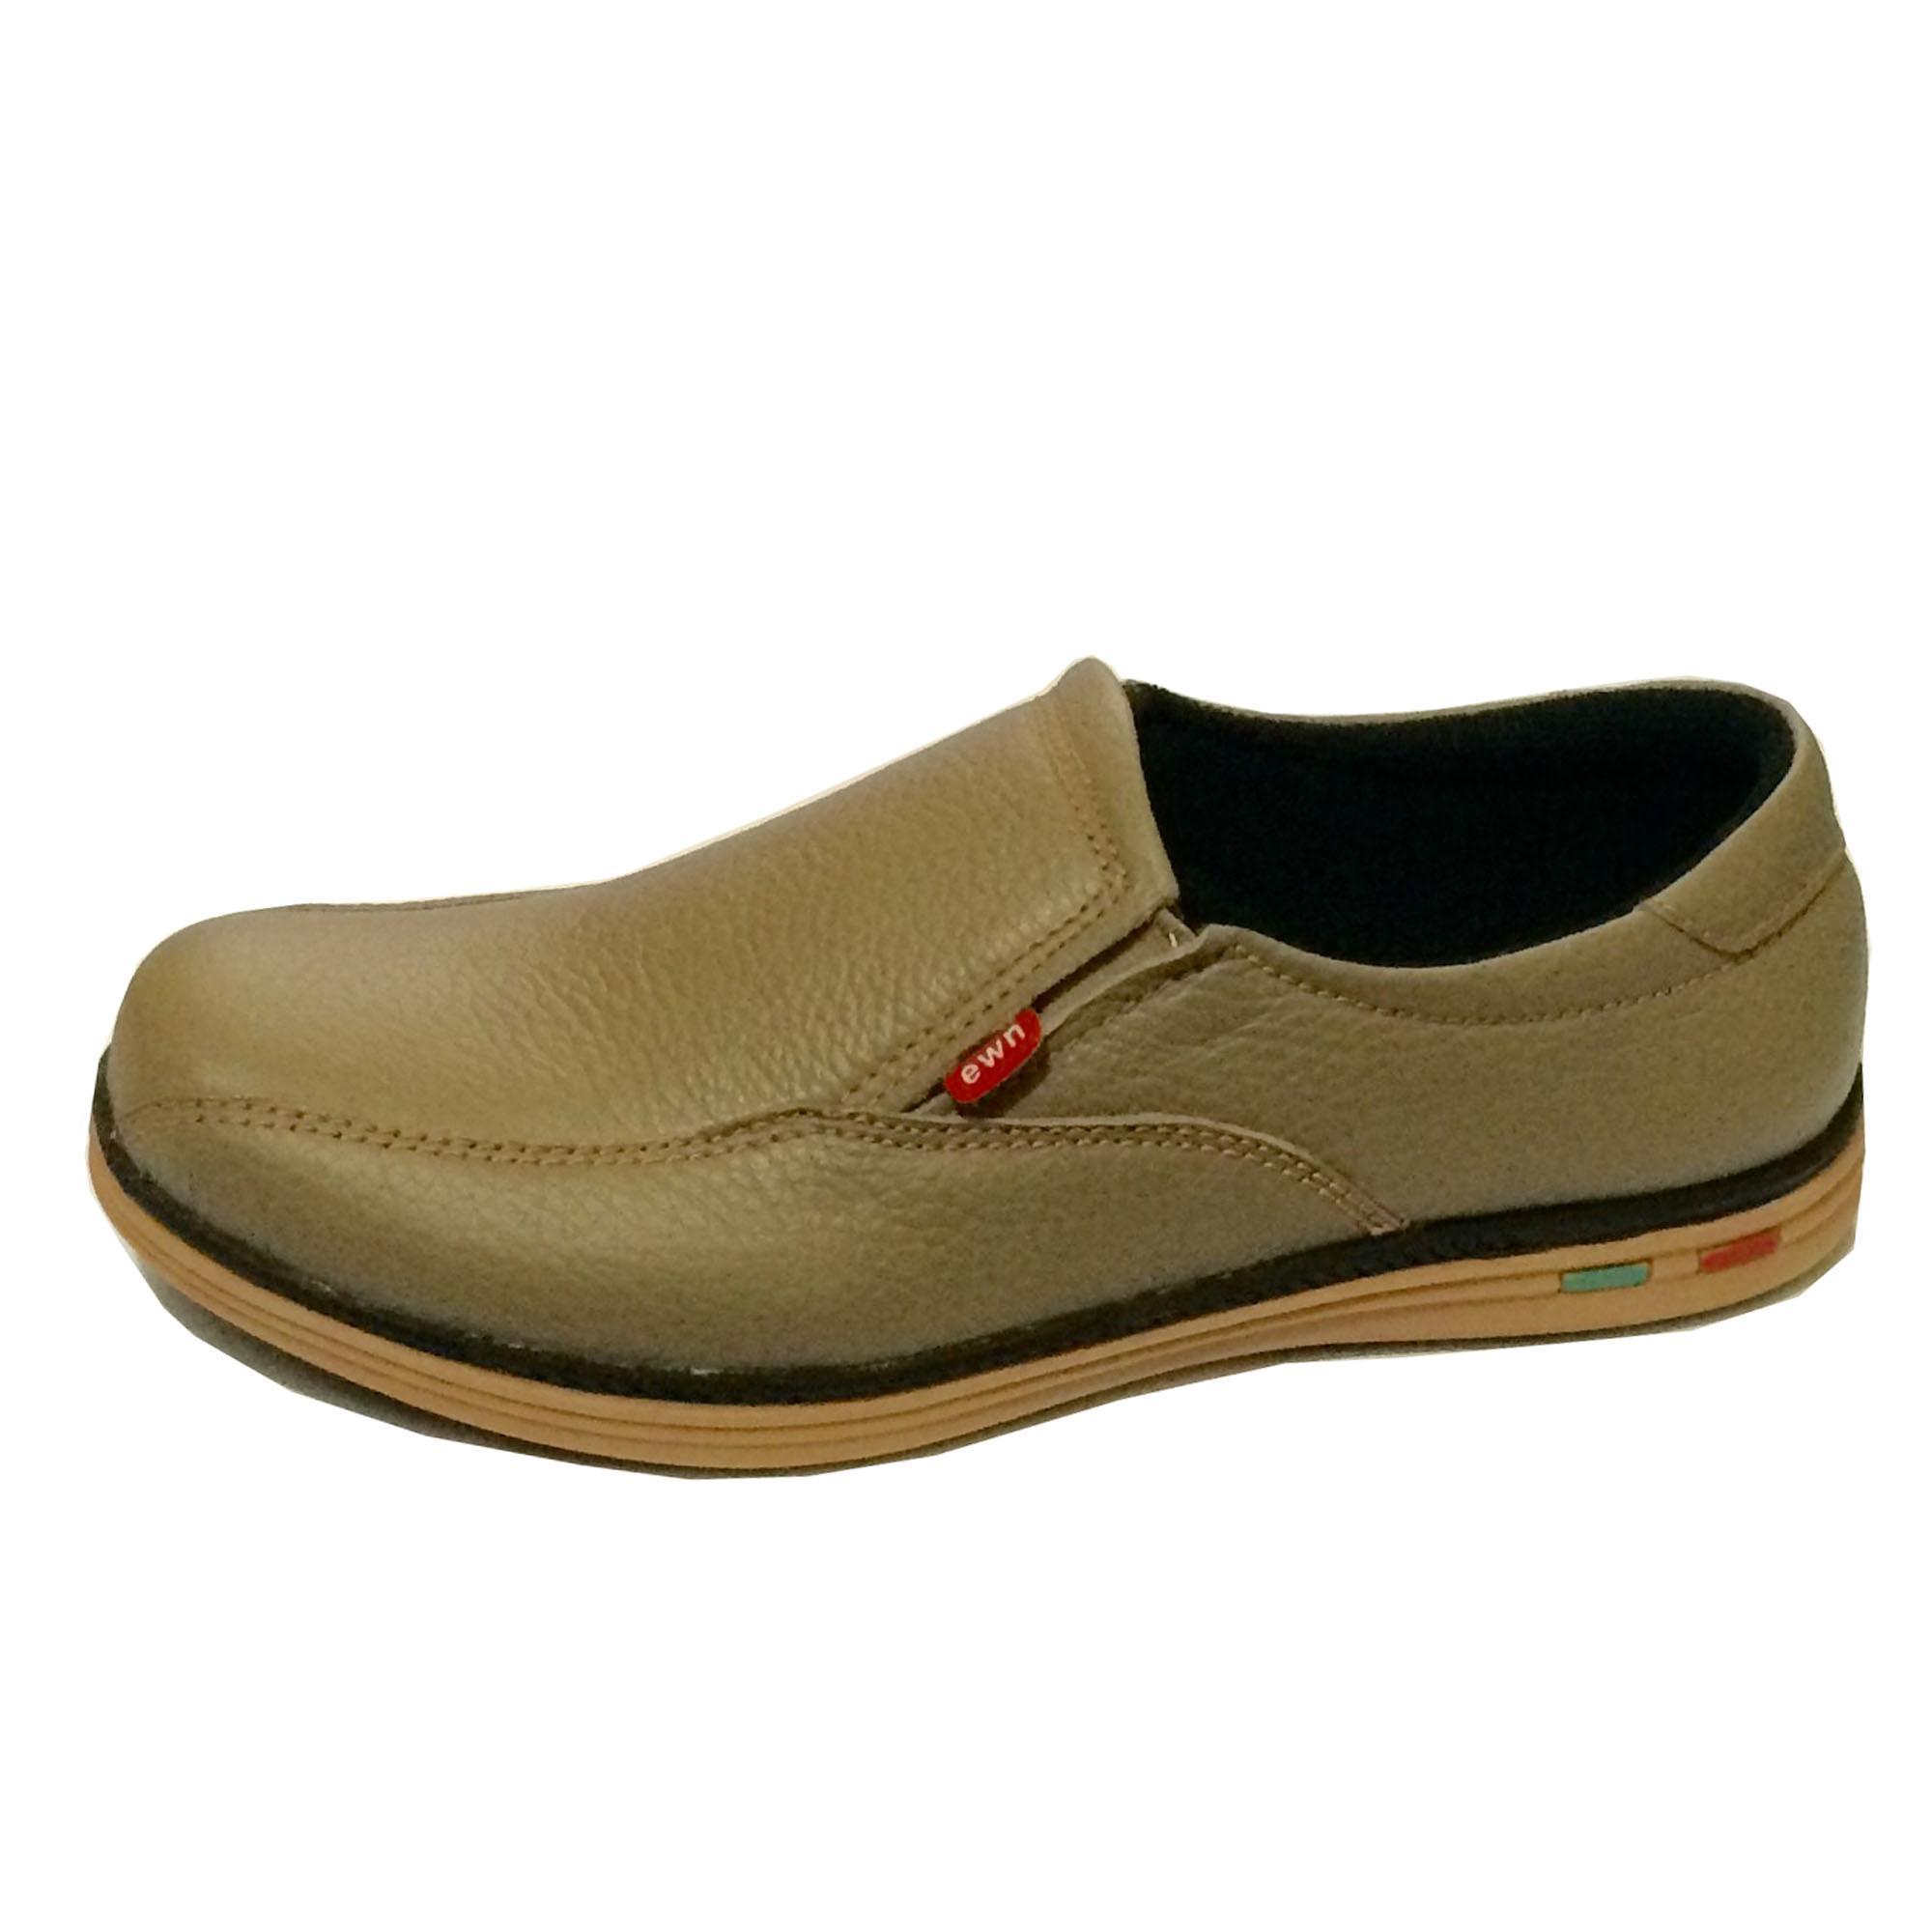 JUALAN DISKON Sepatu Casual Pria Ardiles Kasai Abu Tua Oranye ~ Jual ... c3403ce629